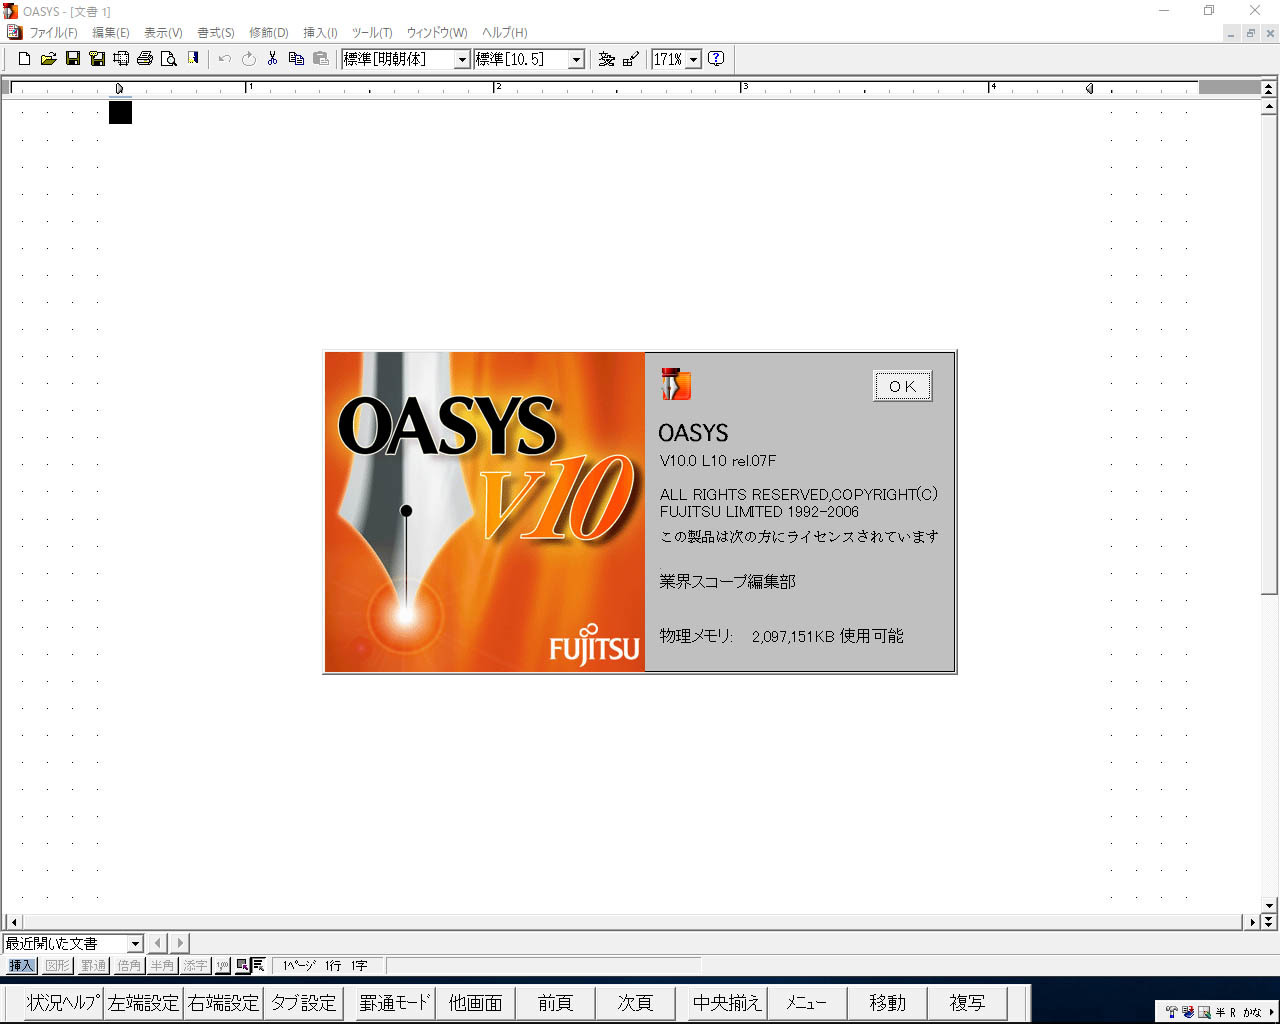 OASYS V10画面